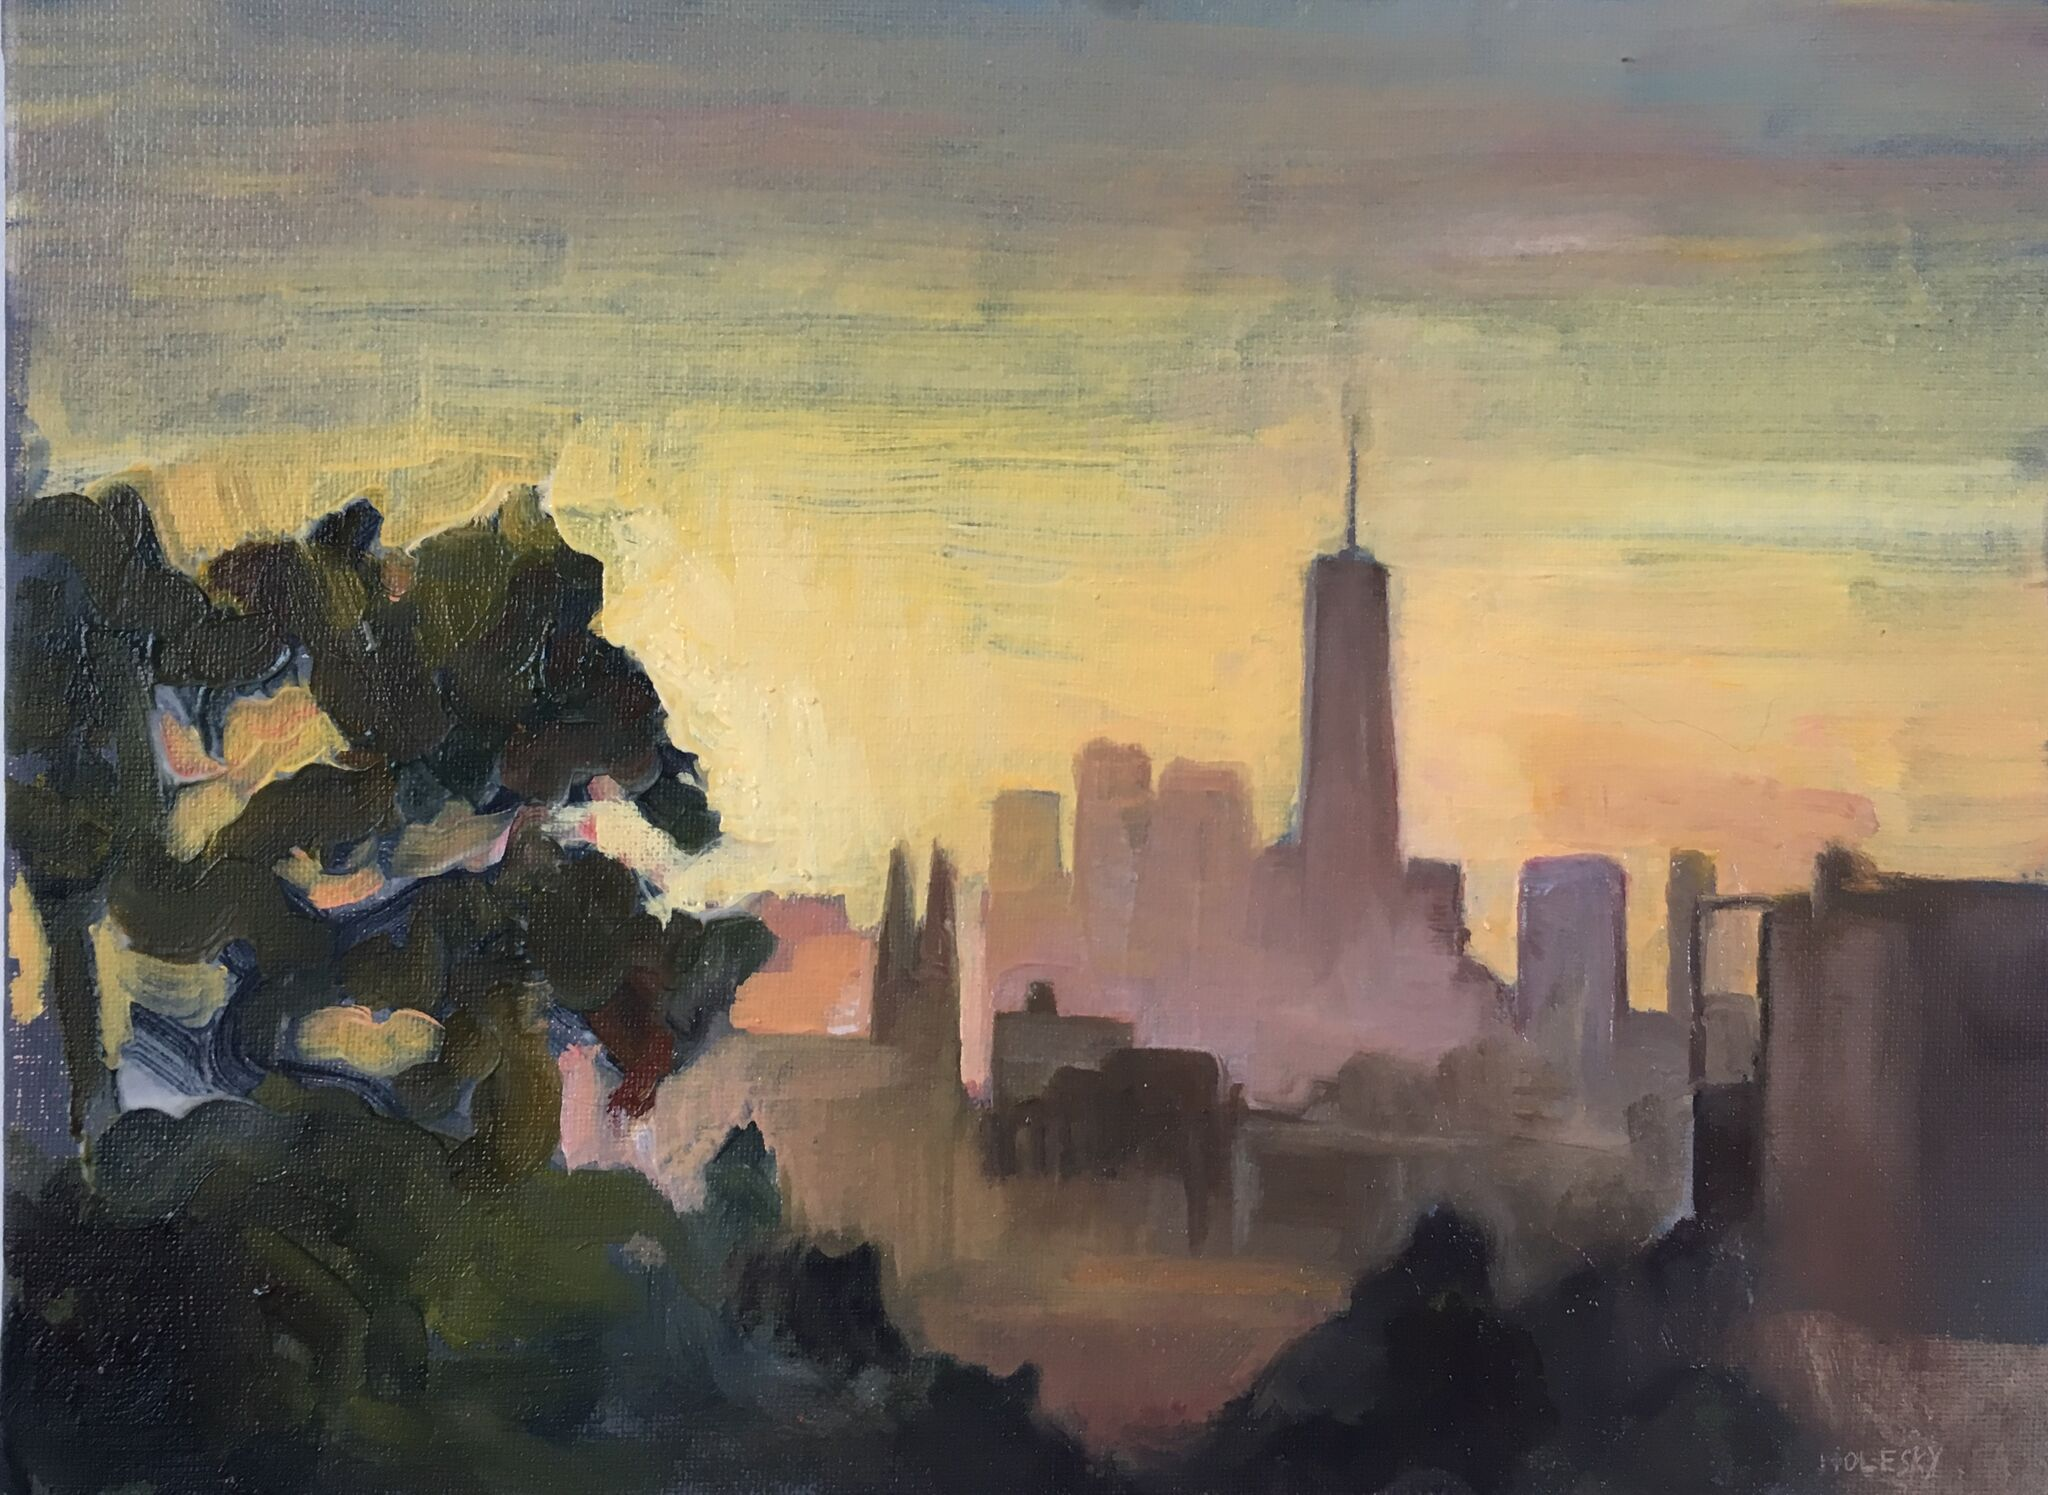 Freedom Tower from Bushwick